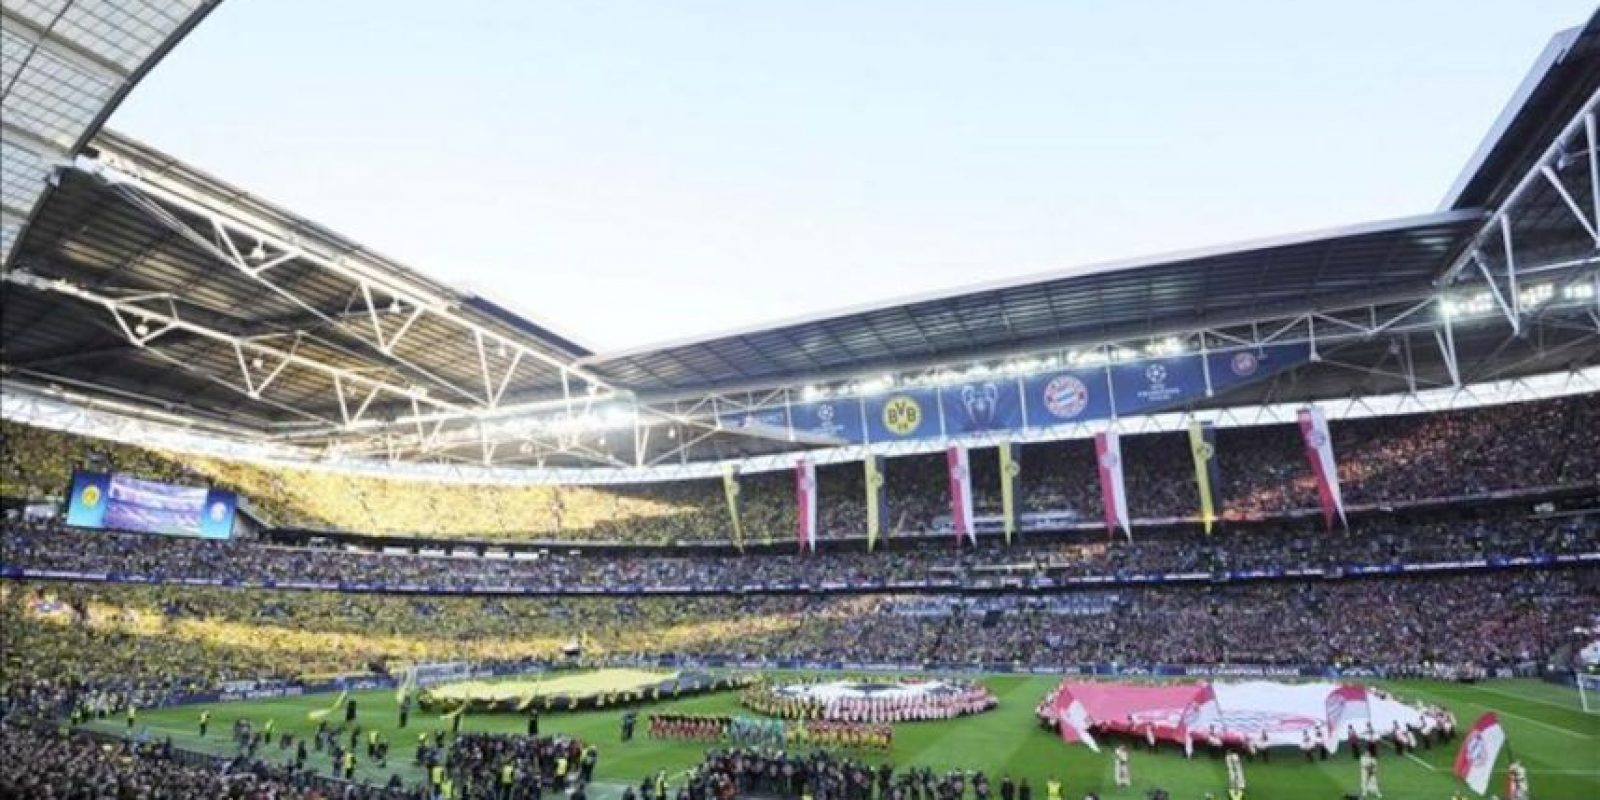 Imagen general de Wembley antes de la final de la Liga de Campeones. . EFE